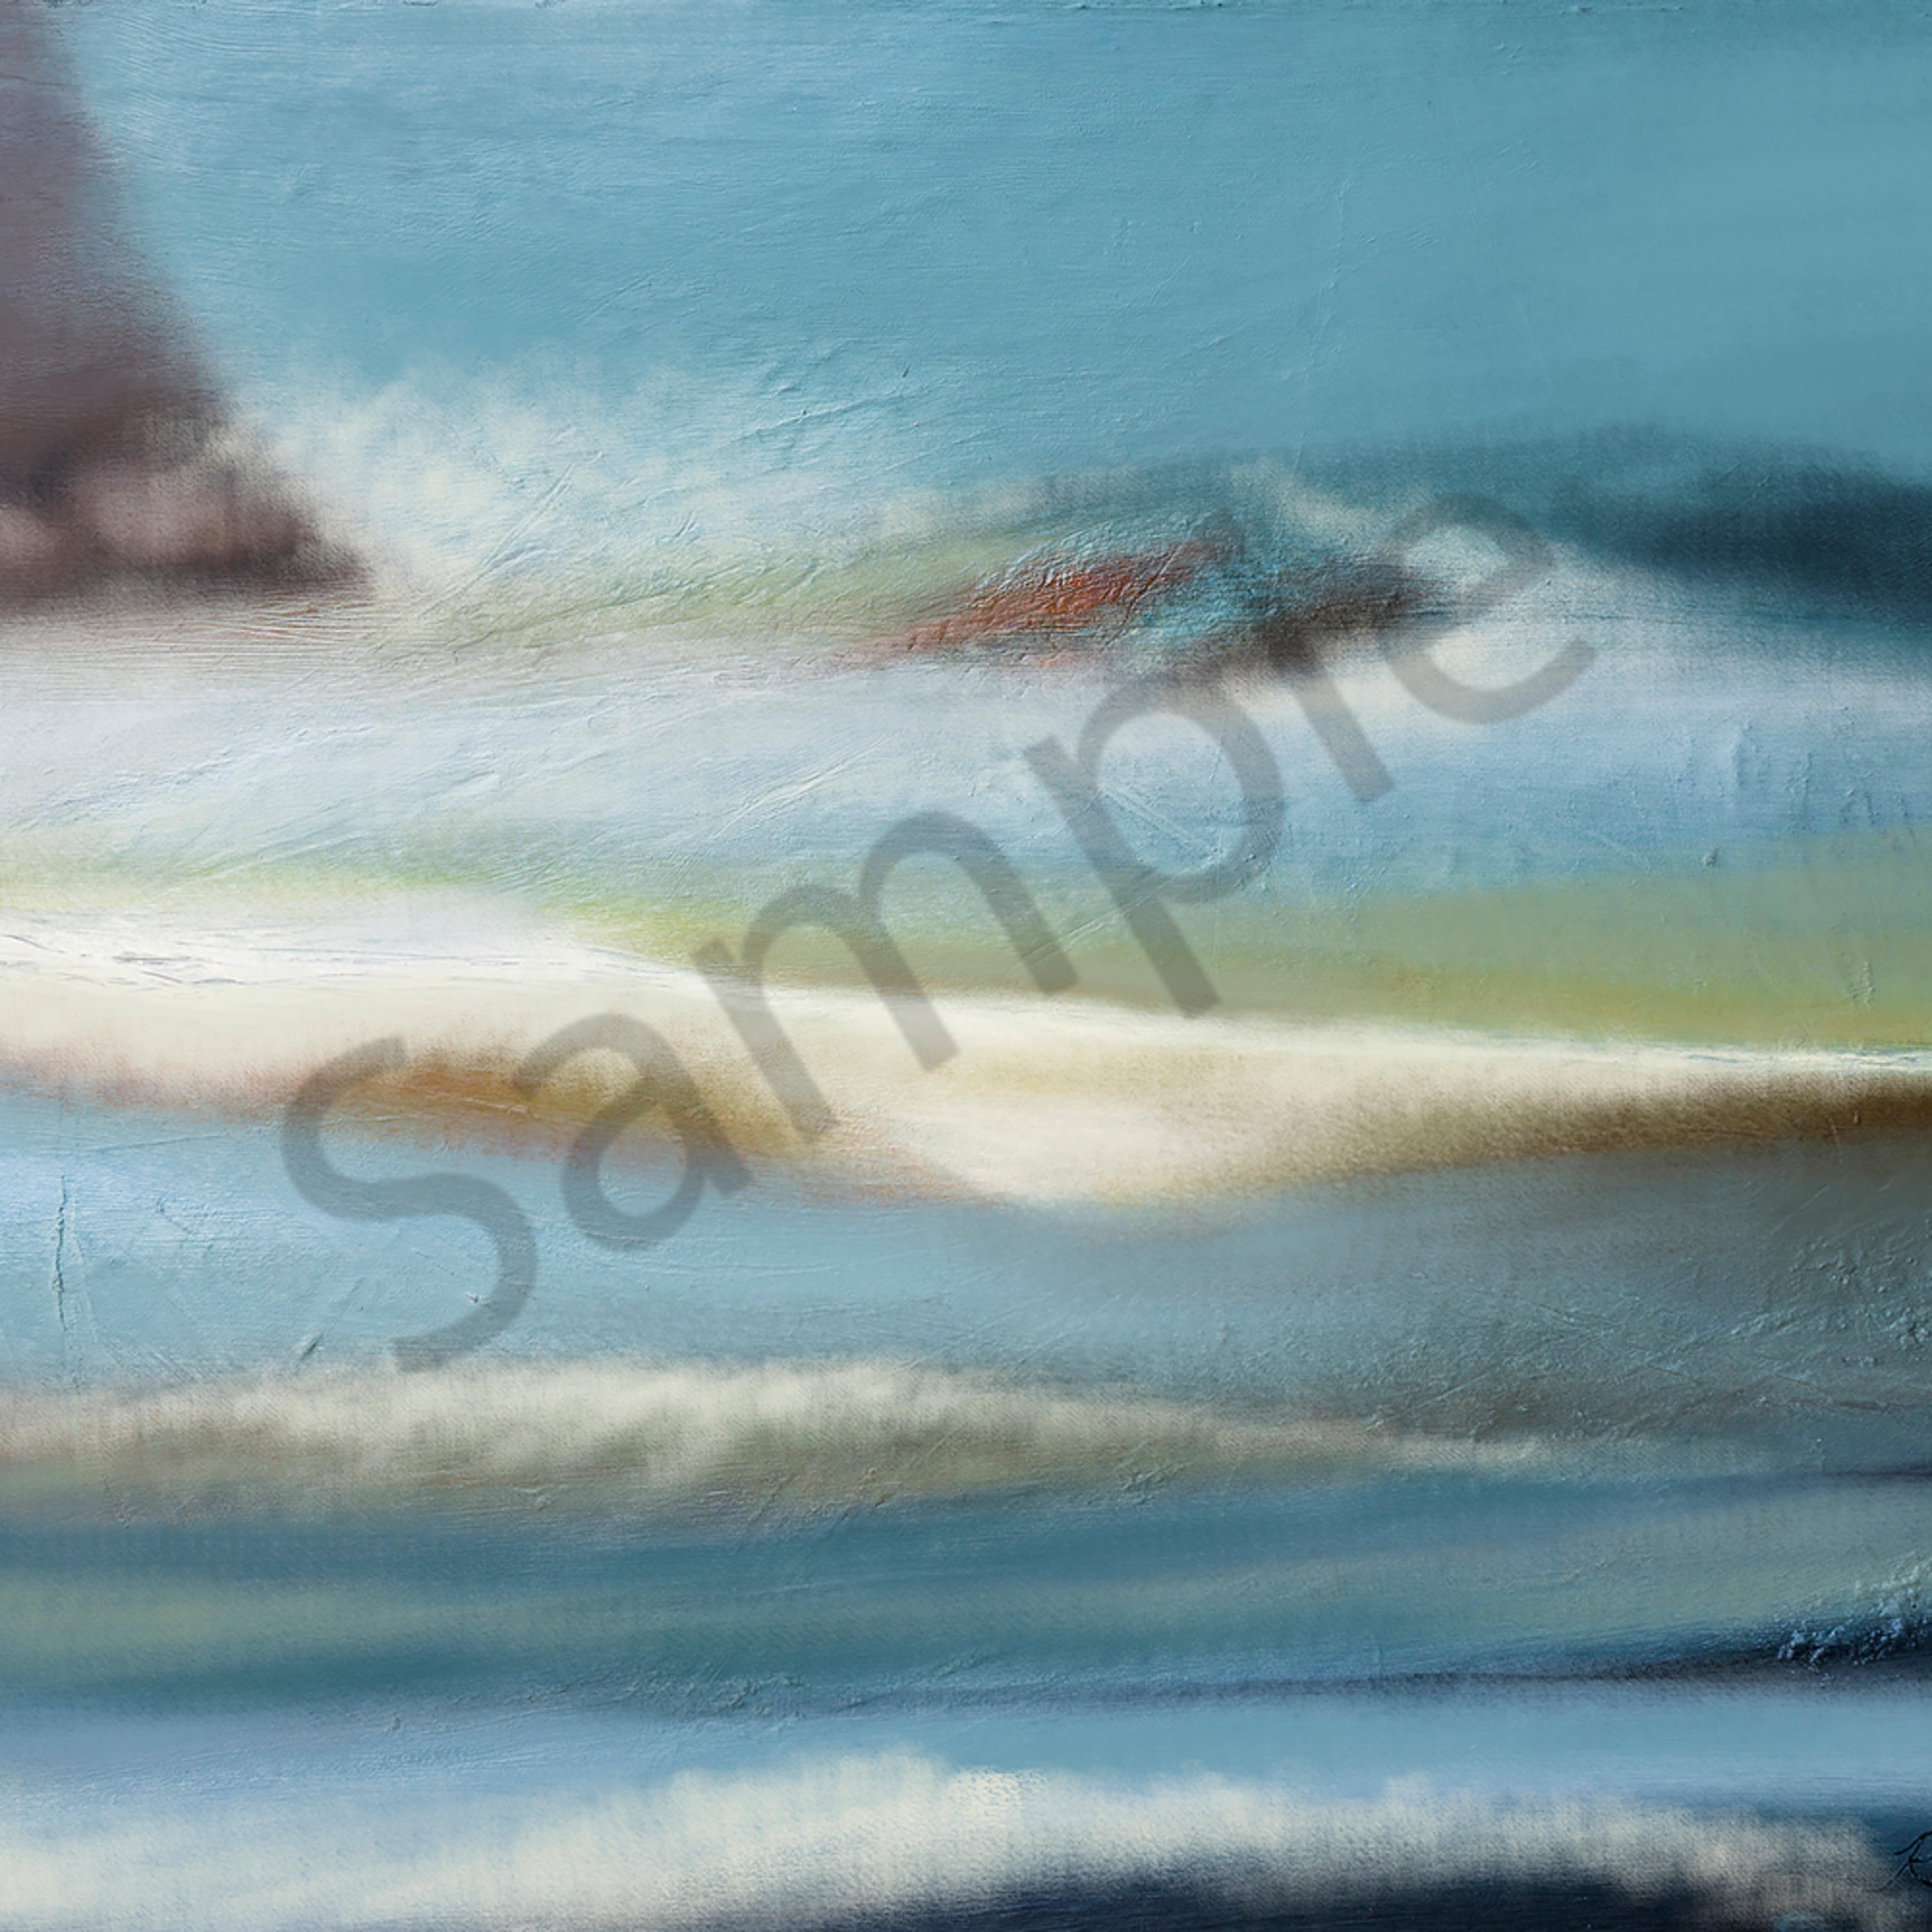 Sea swells akxxw2